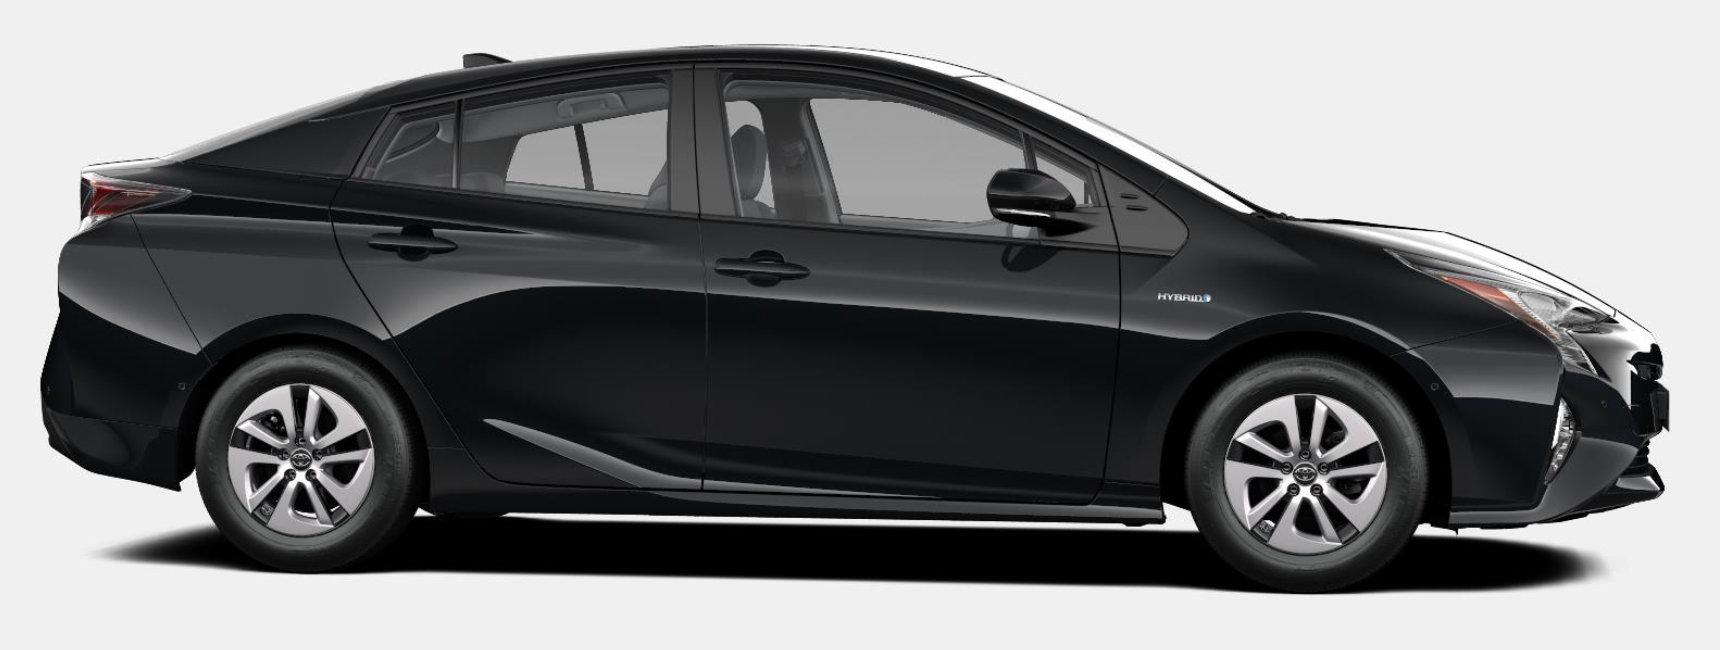 Toyota-Prius-leasen-2